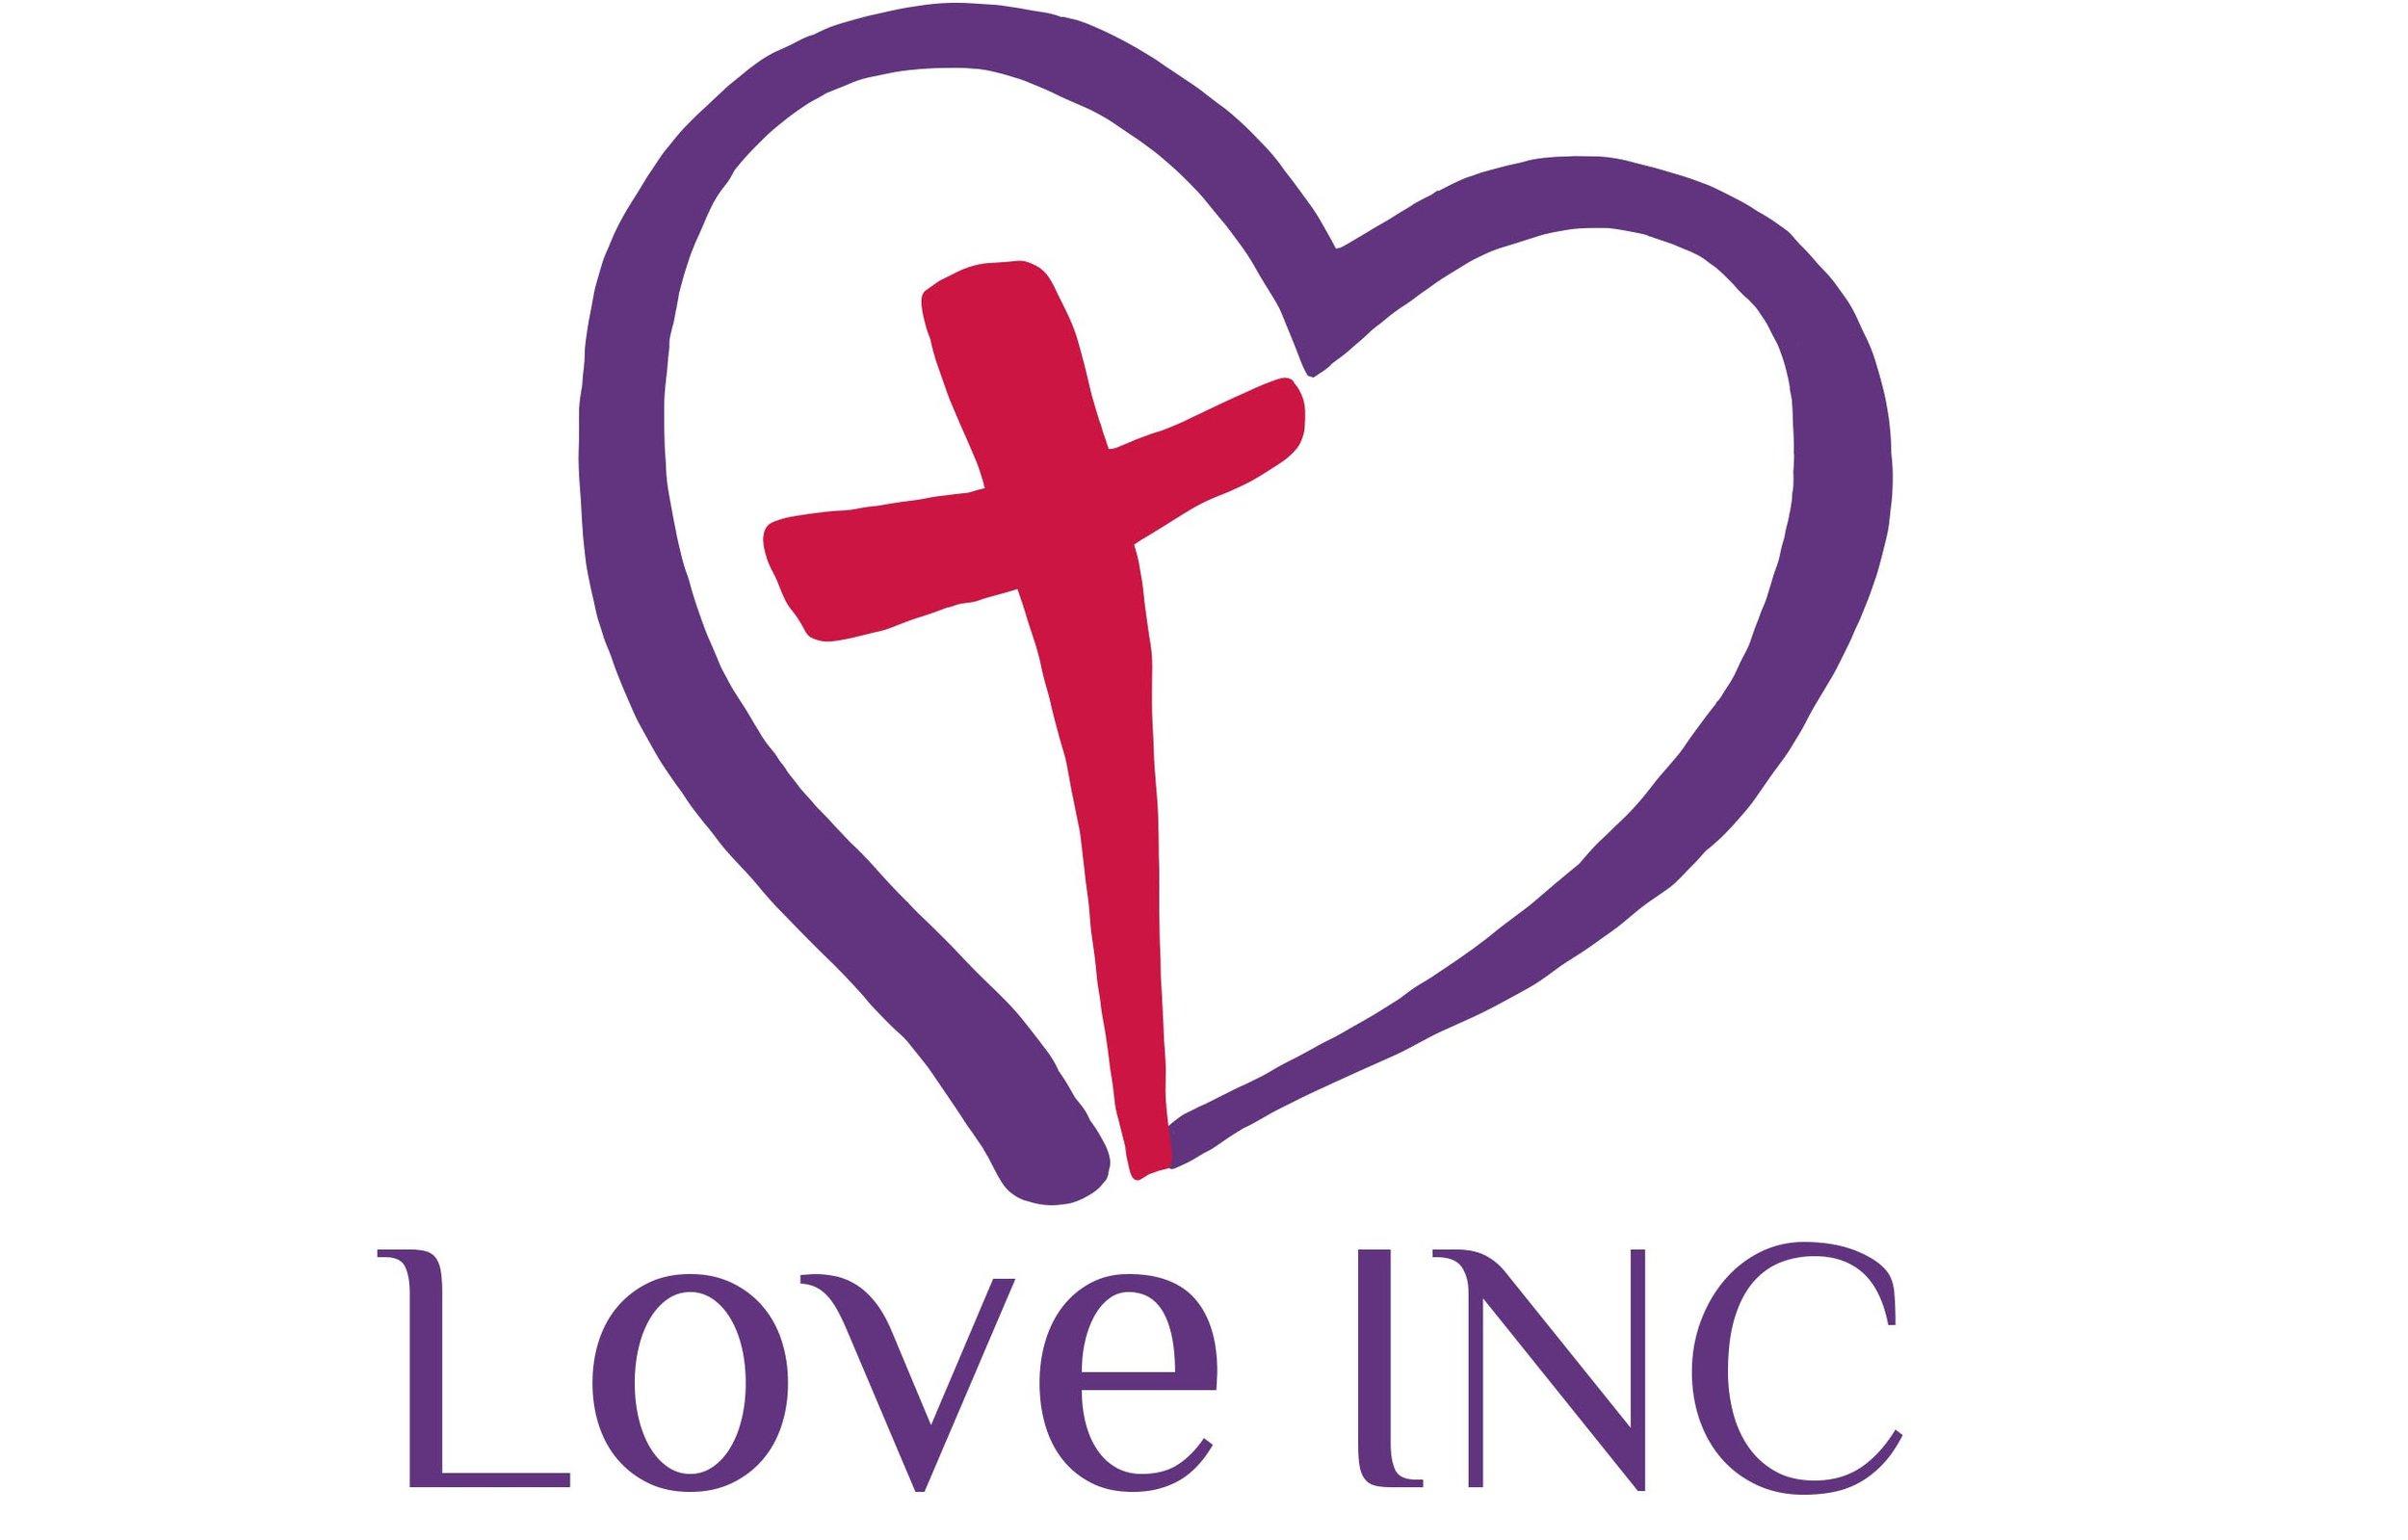 Love_INC_new_logo_Color_37b9ebe1aefb26bce4f30f9eeab8719f.jpg